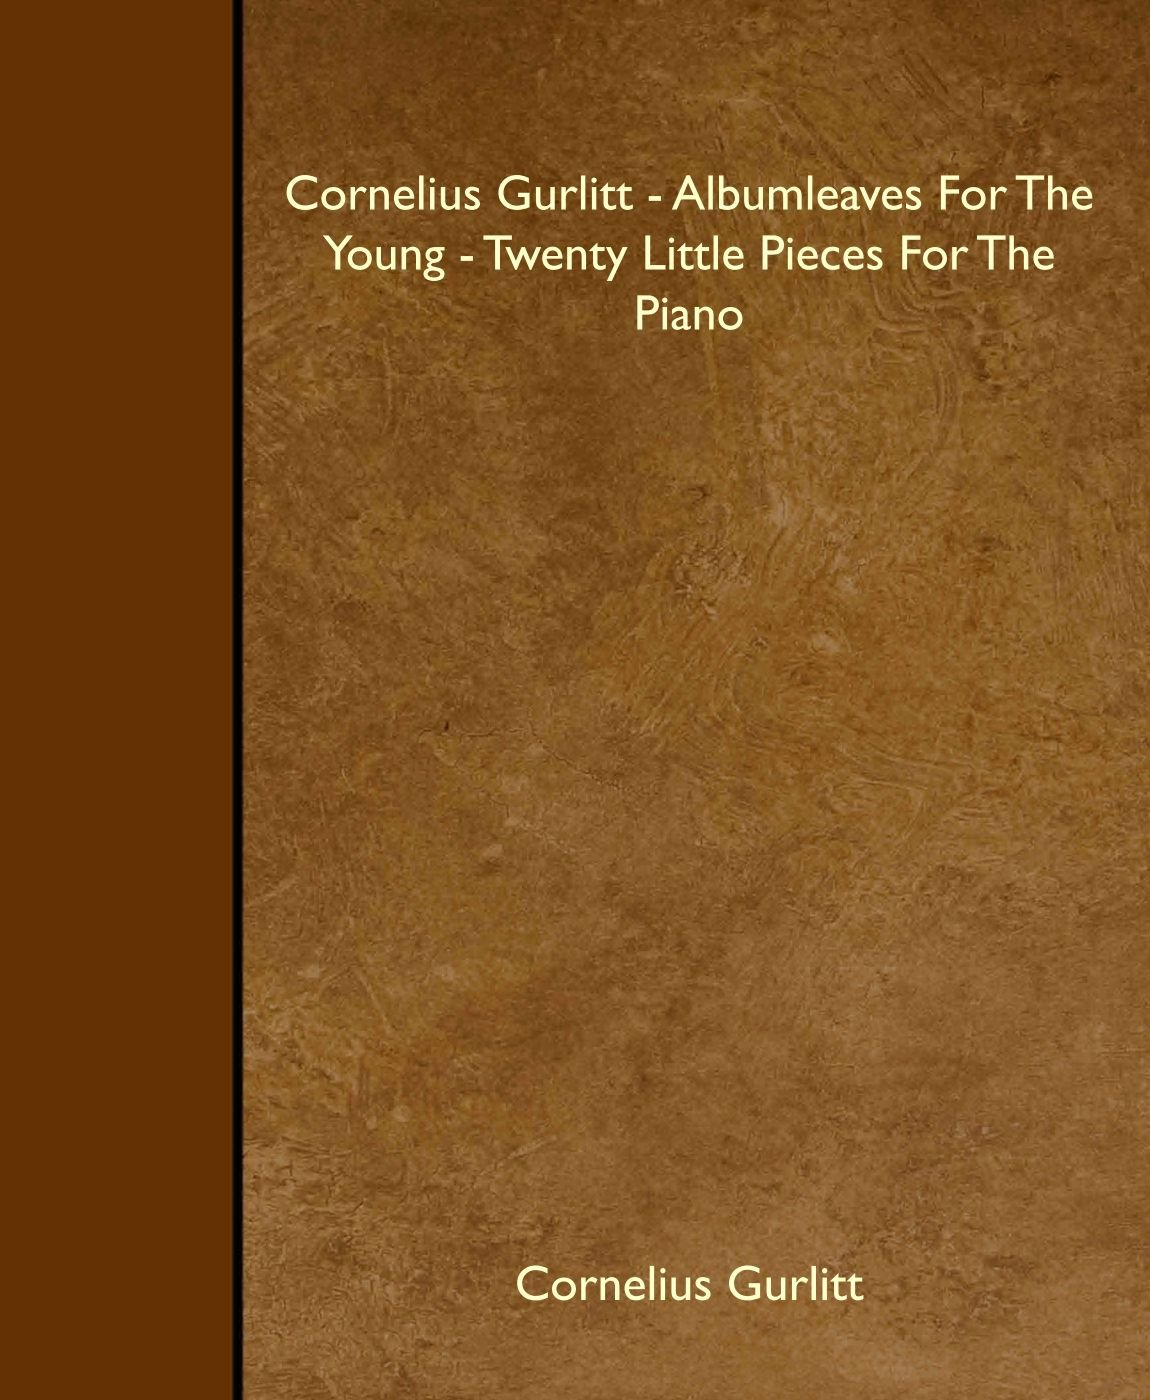 Download Cornelius Gurlitt - Albumleaves For The Young - Twenty Little Pieces For The Piano ebook